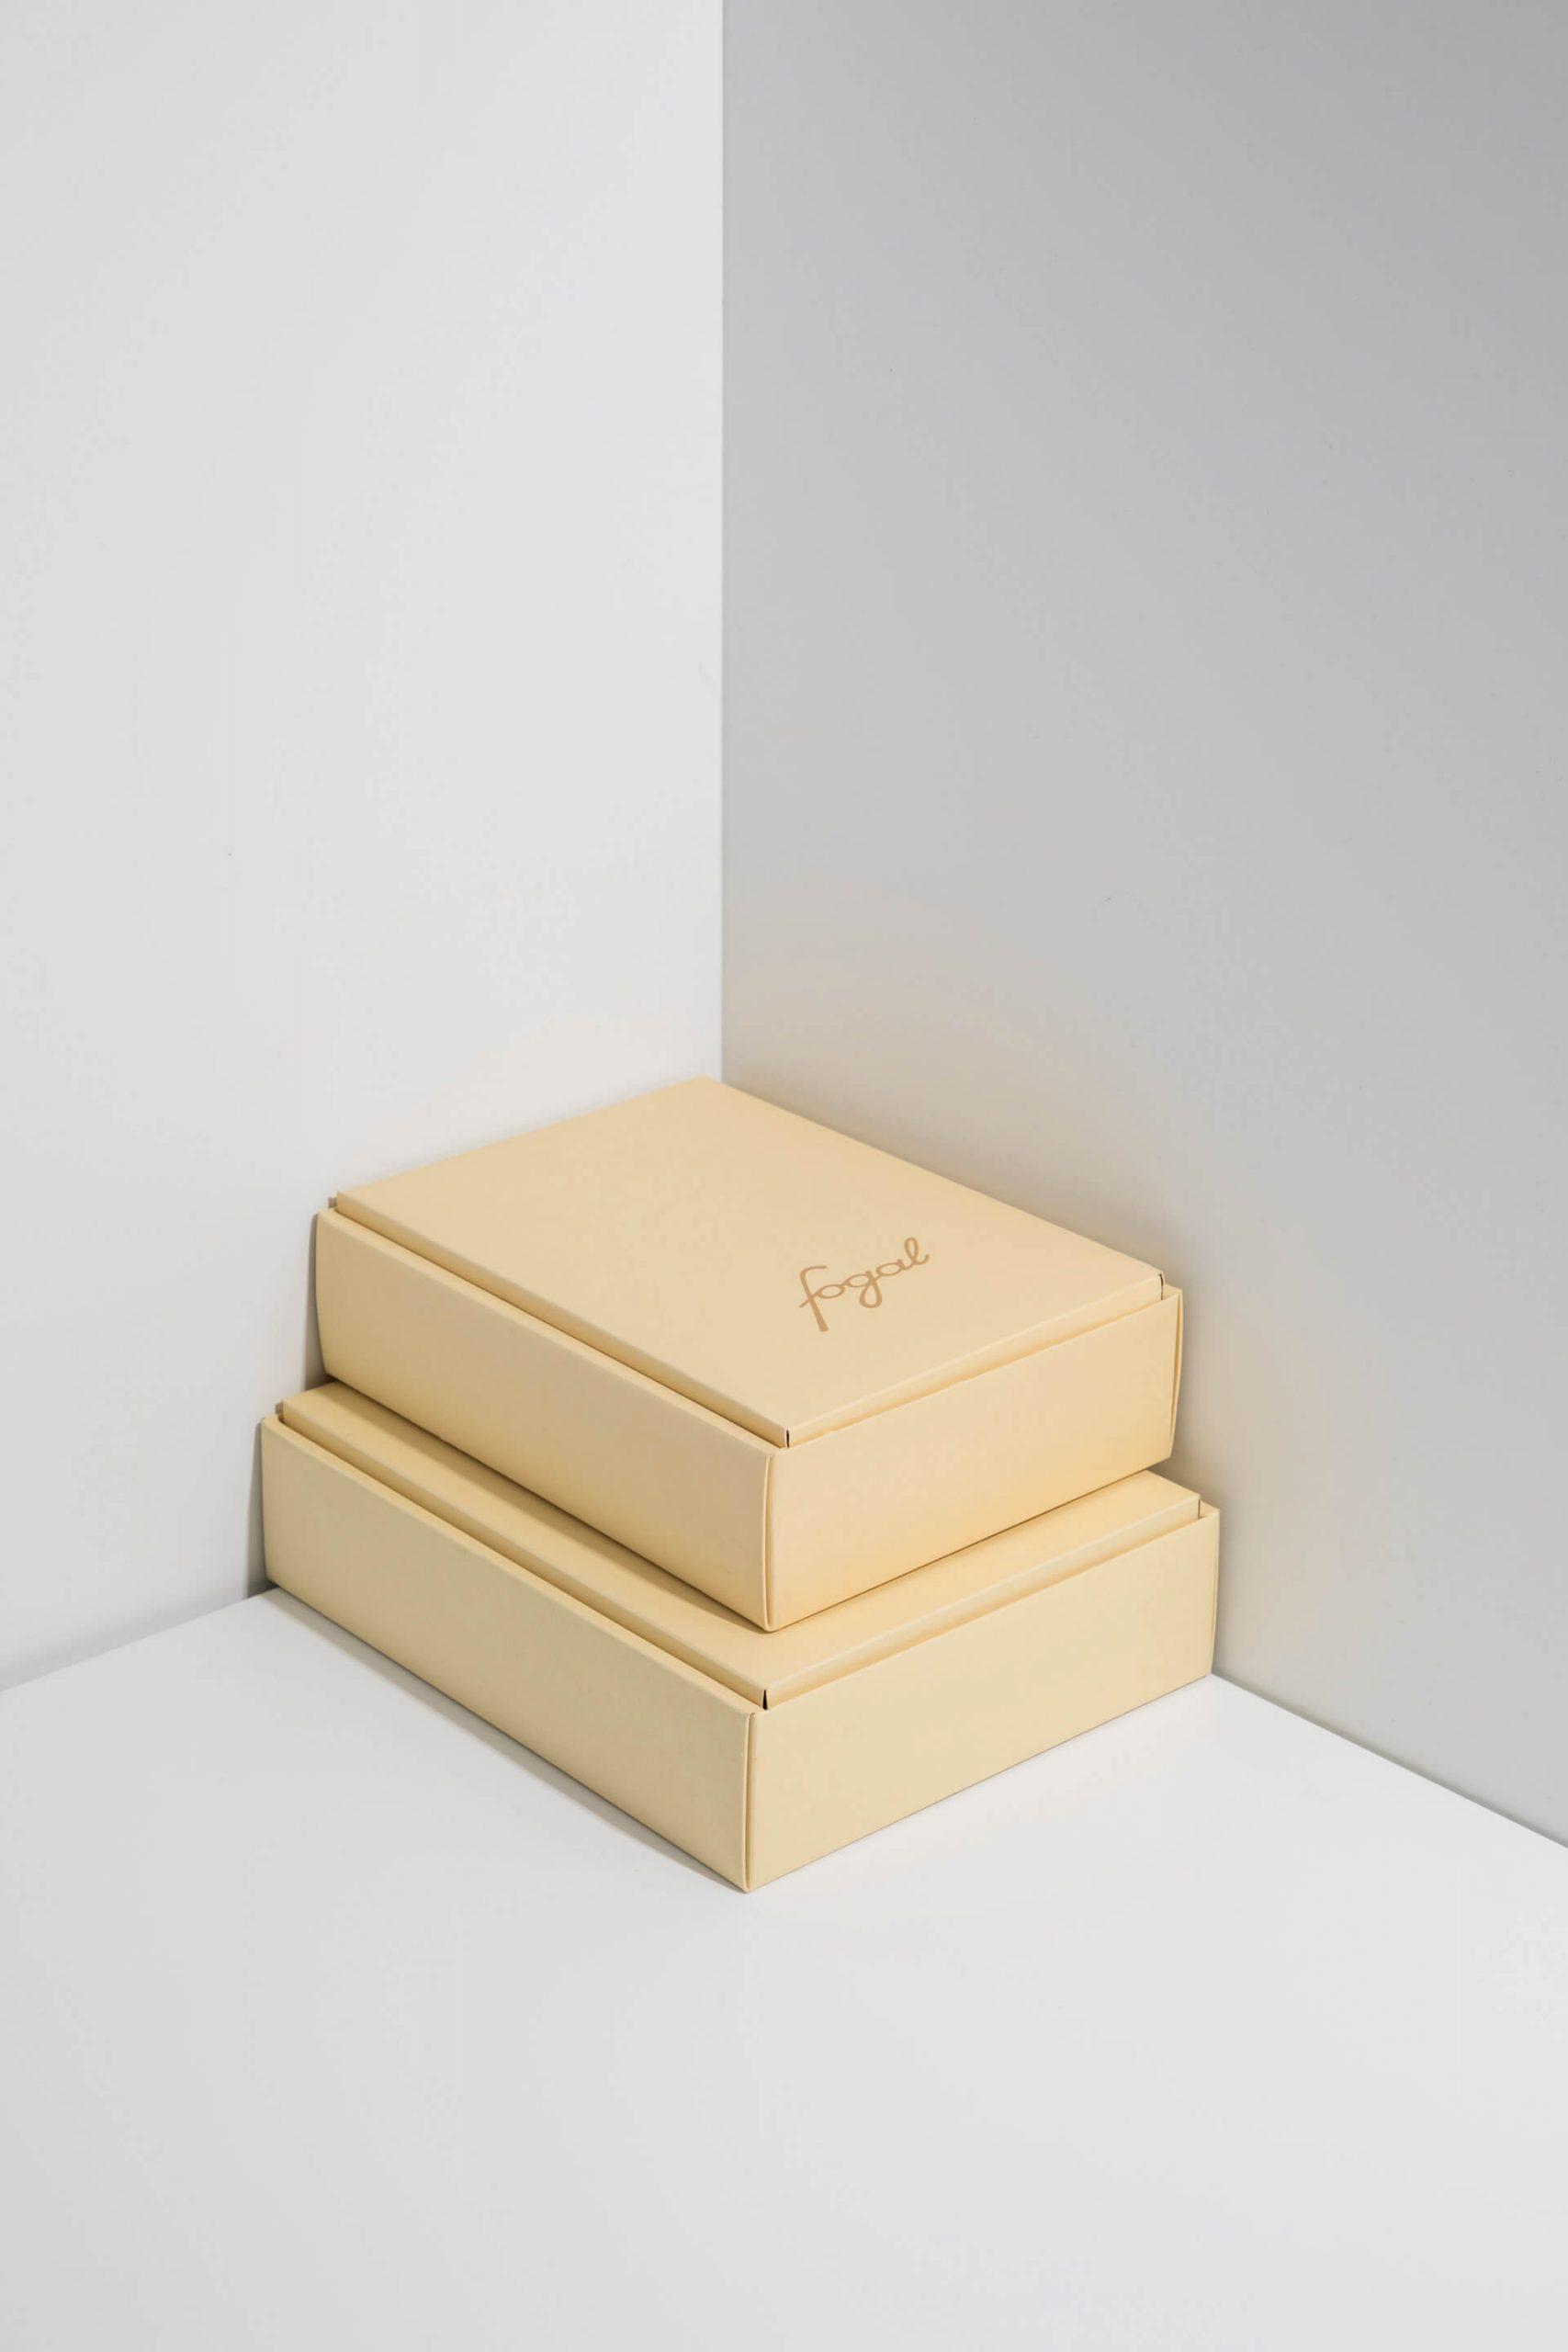 fogal-packaging-3